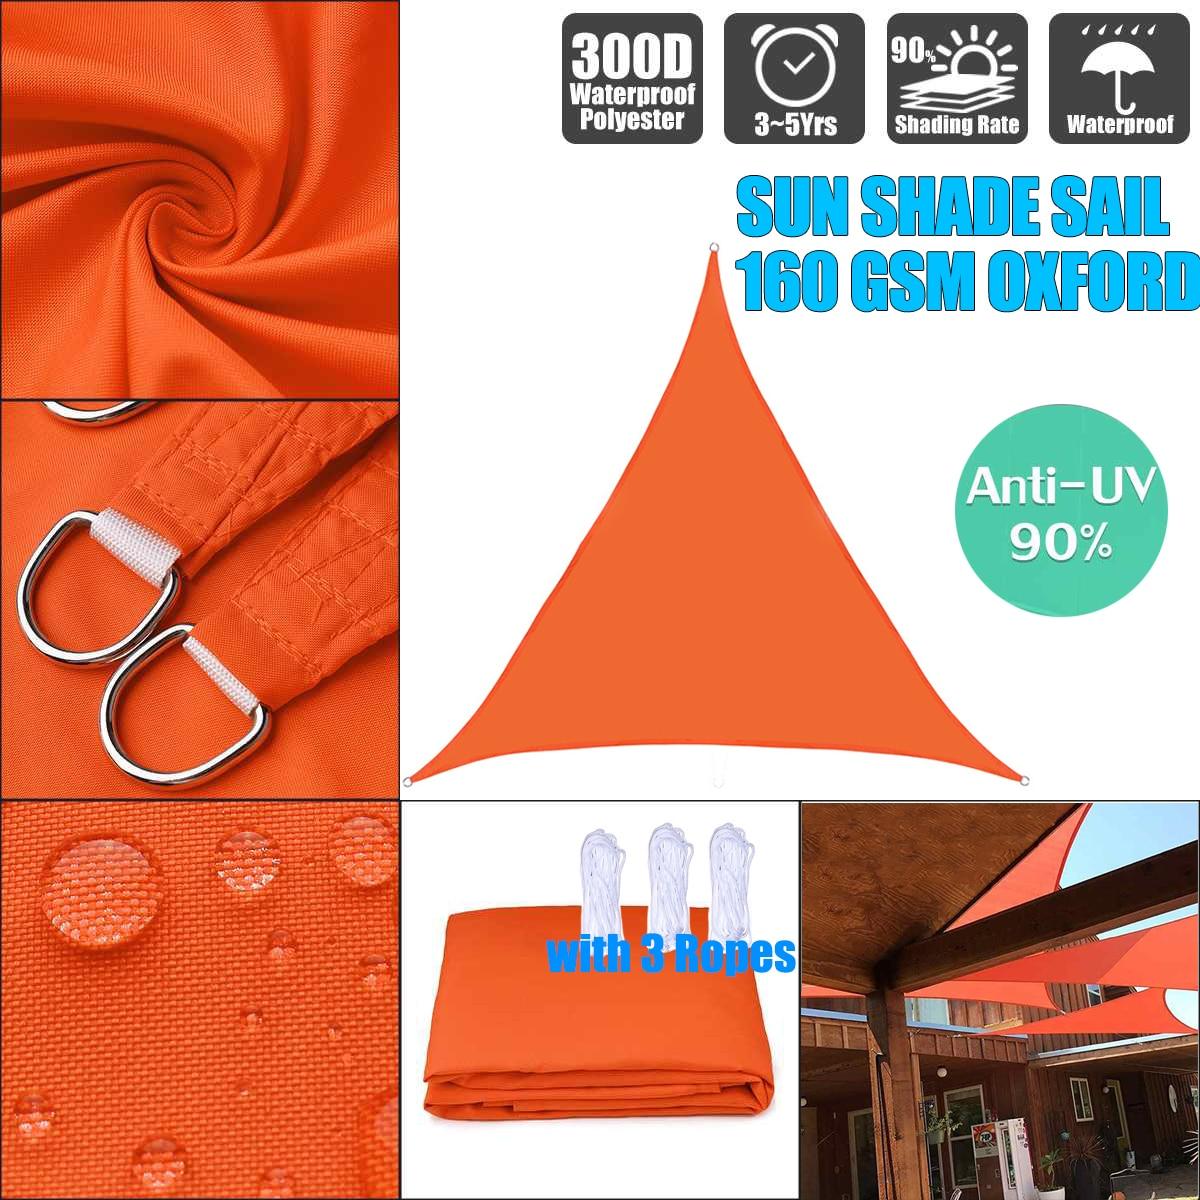 Toldo naranja Regular triángulo parasol exterior toldo impermeable protección exterior toldo jardín Patio piscina sombra vela